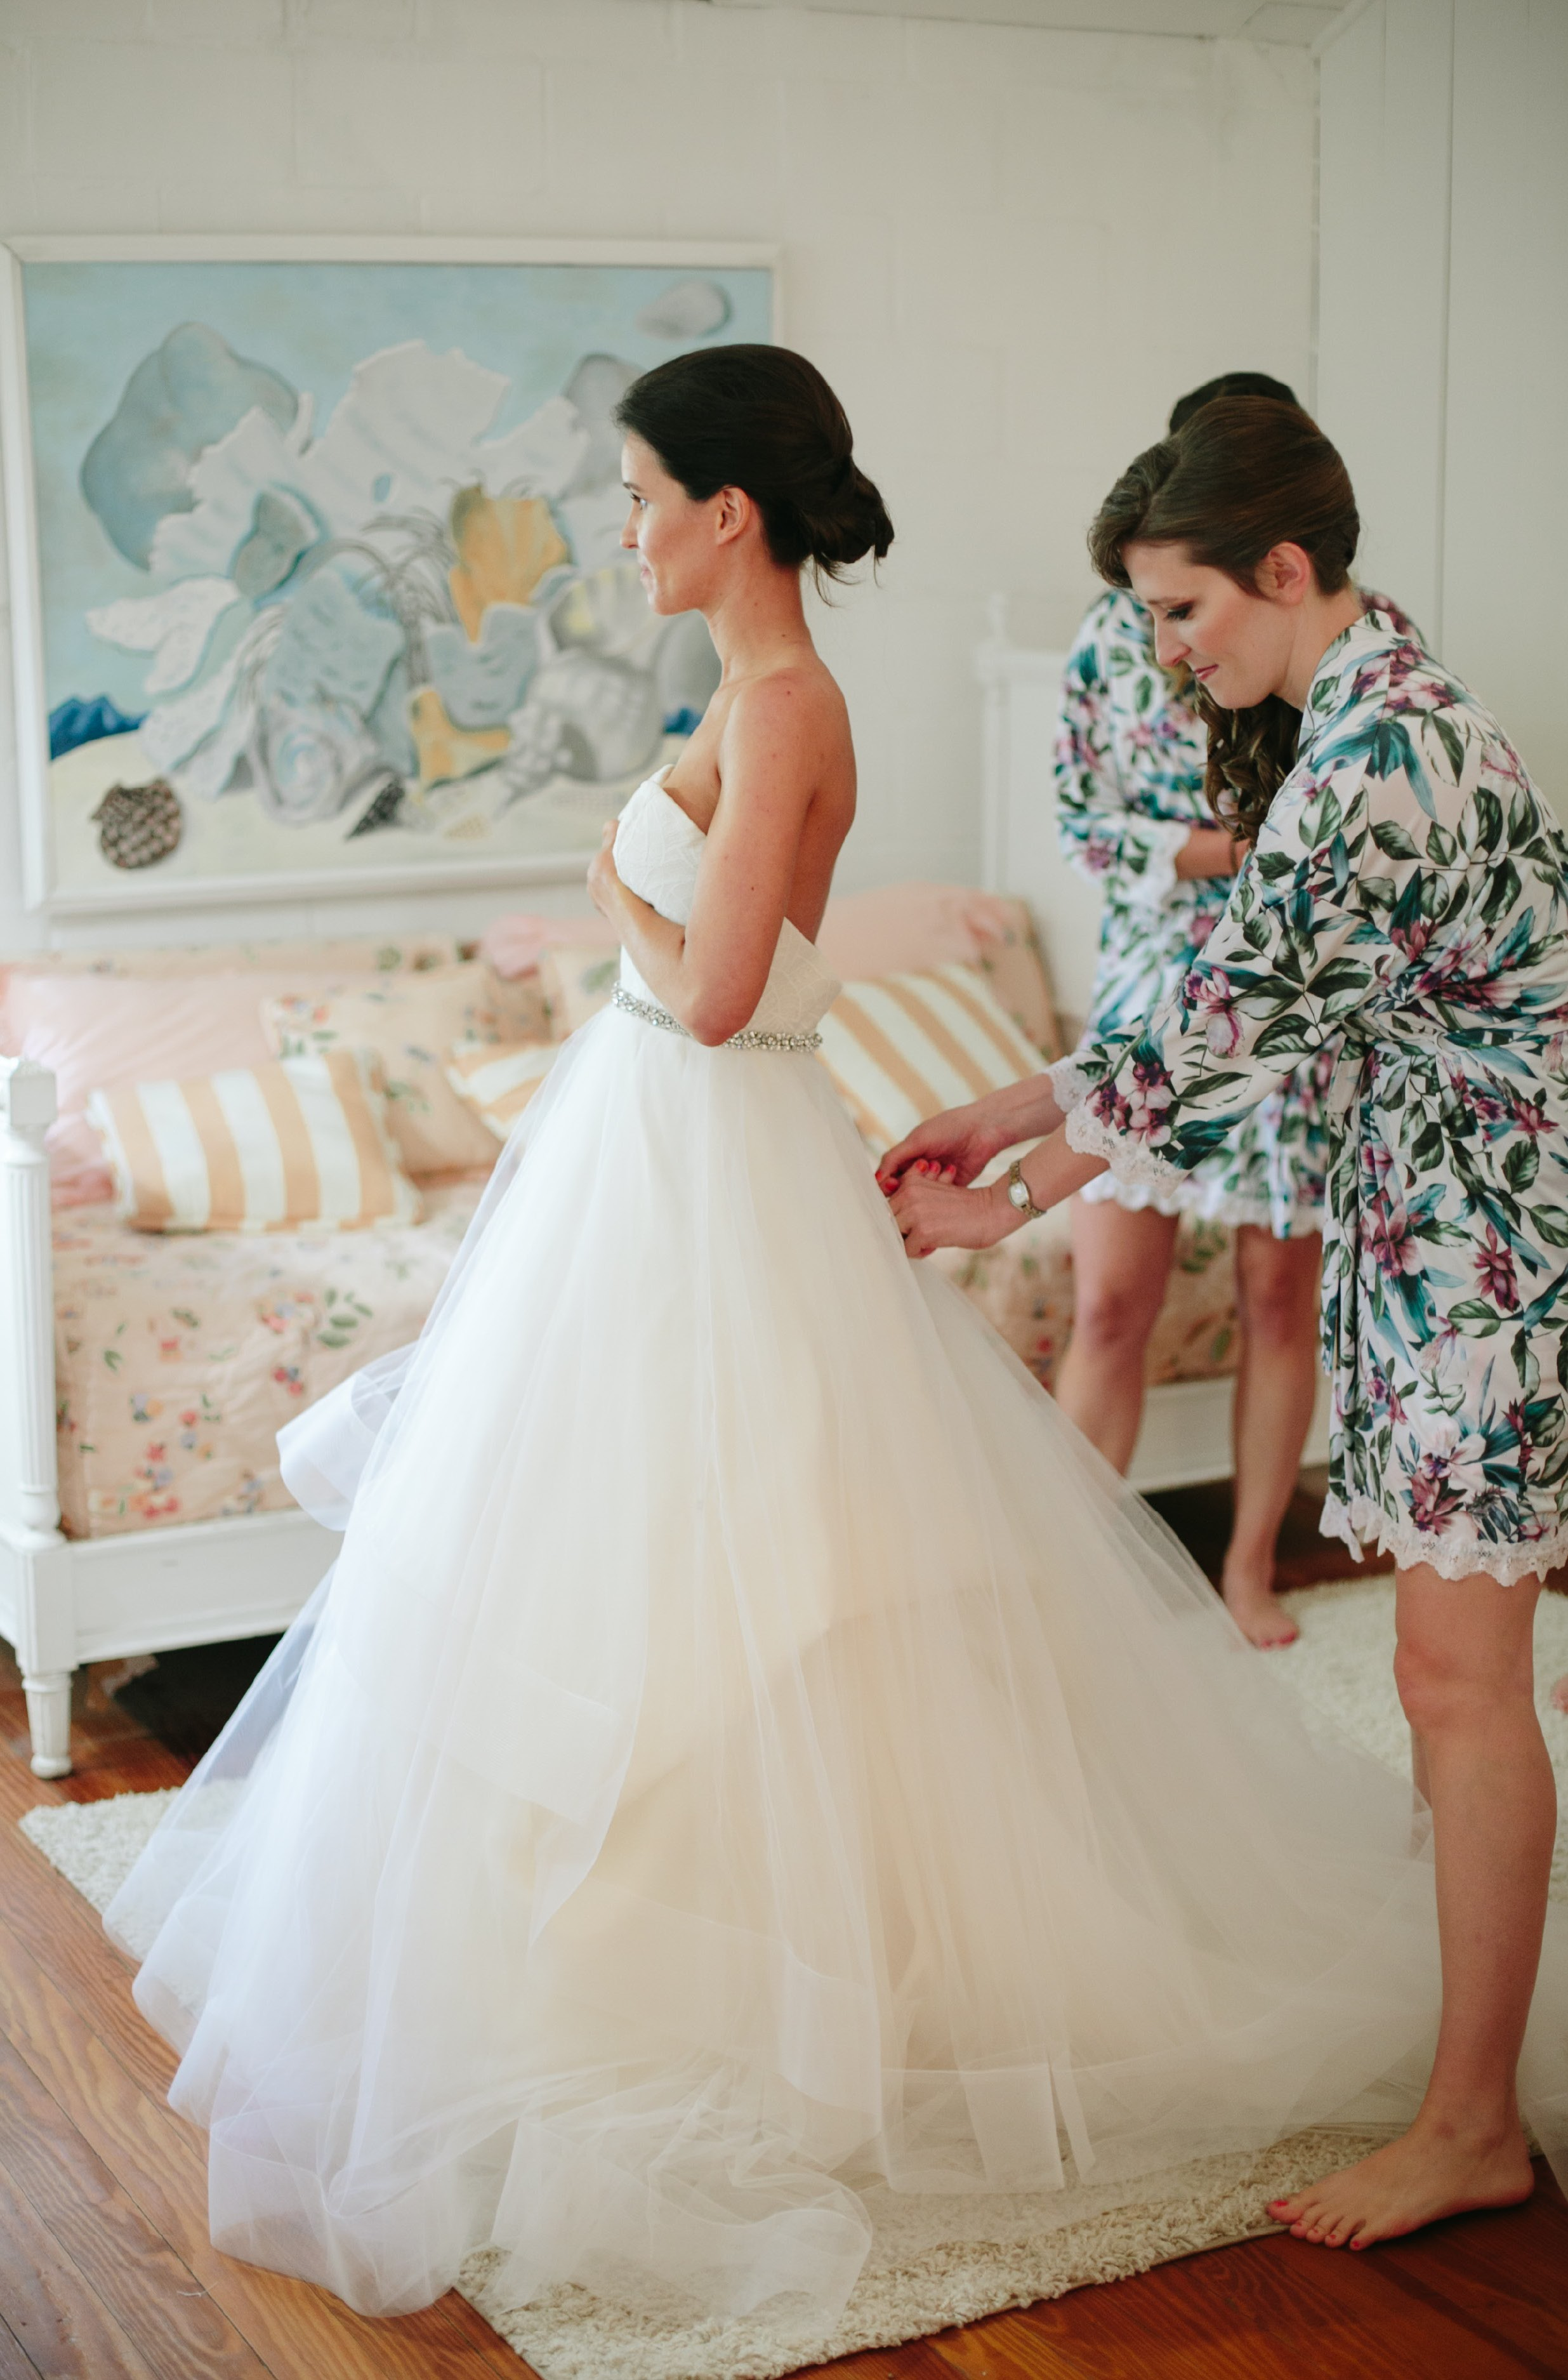 Heather + Greg's Wedding at the Bonnet House Ft Lauderdale13.jpg